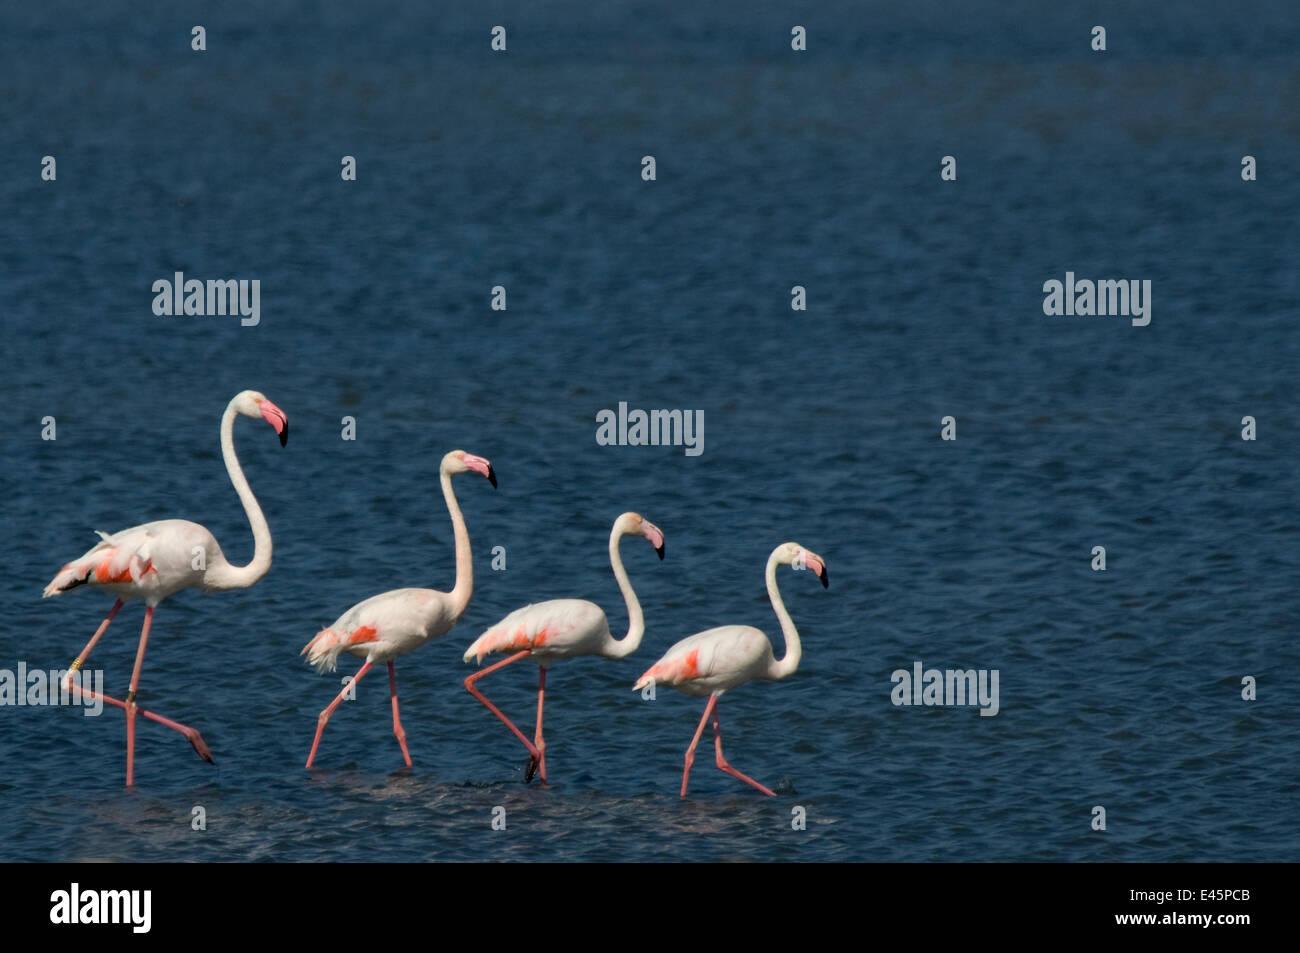 Small flock of Greater flamingo (Phoenicopterus roseus) wading on inland Kalloni lake, Lesbos, Greece - Stock Image